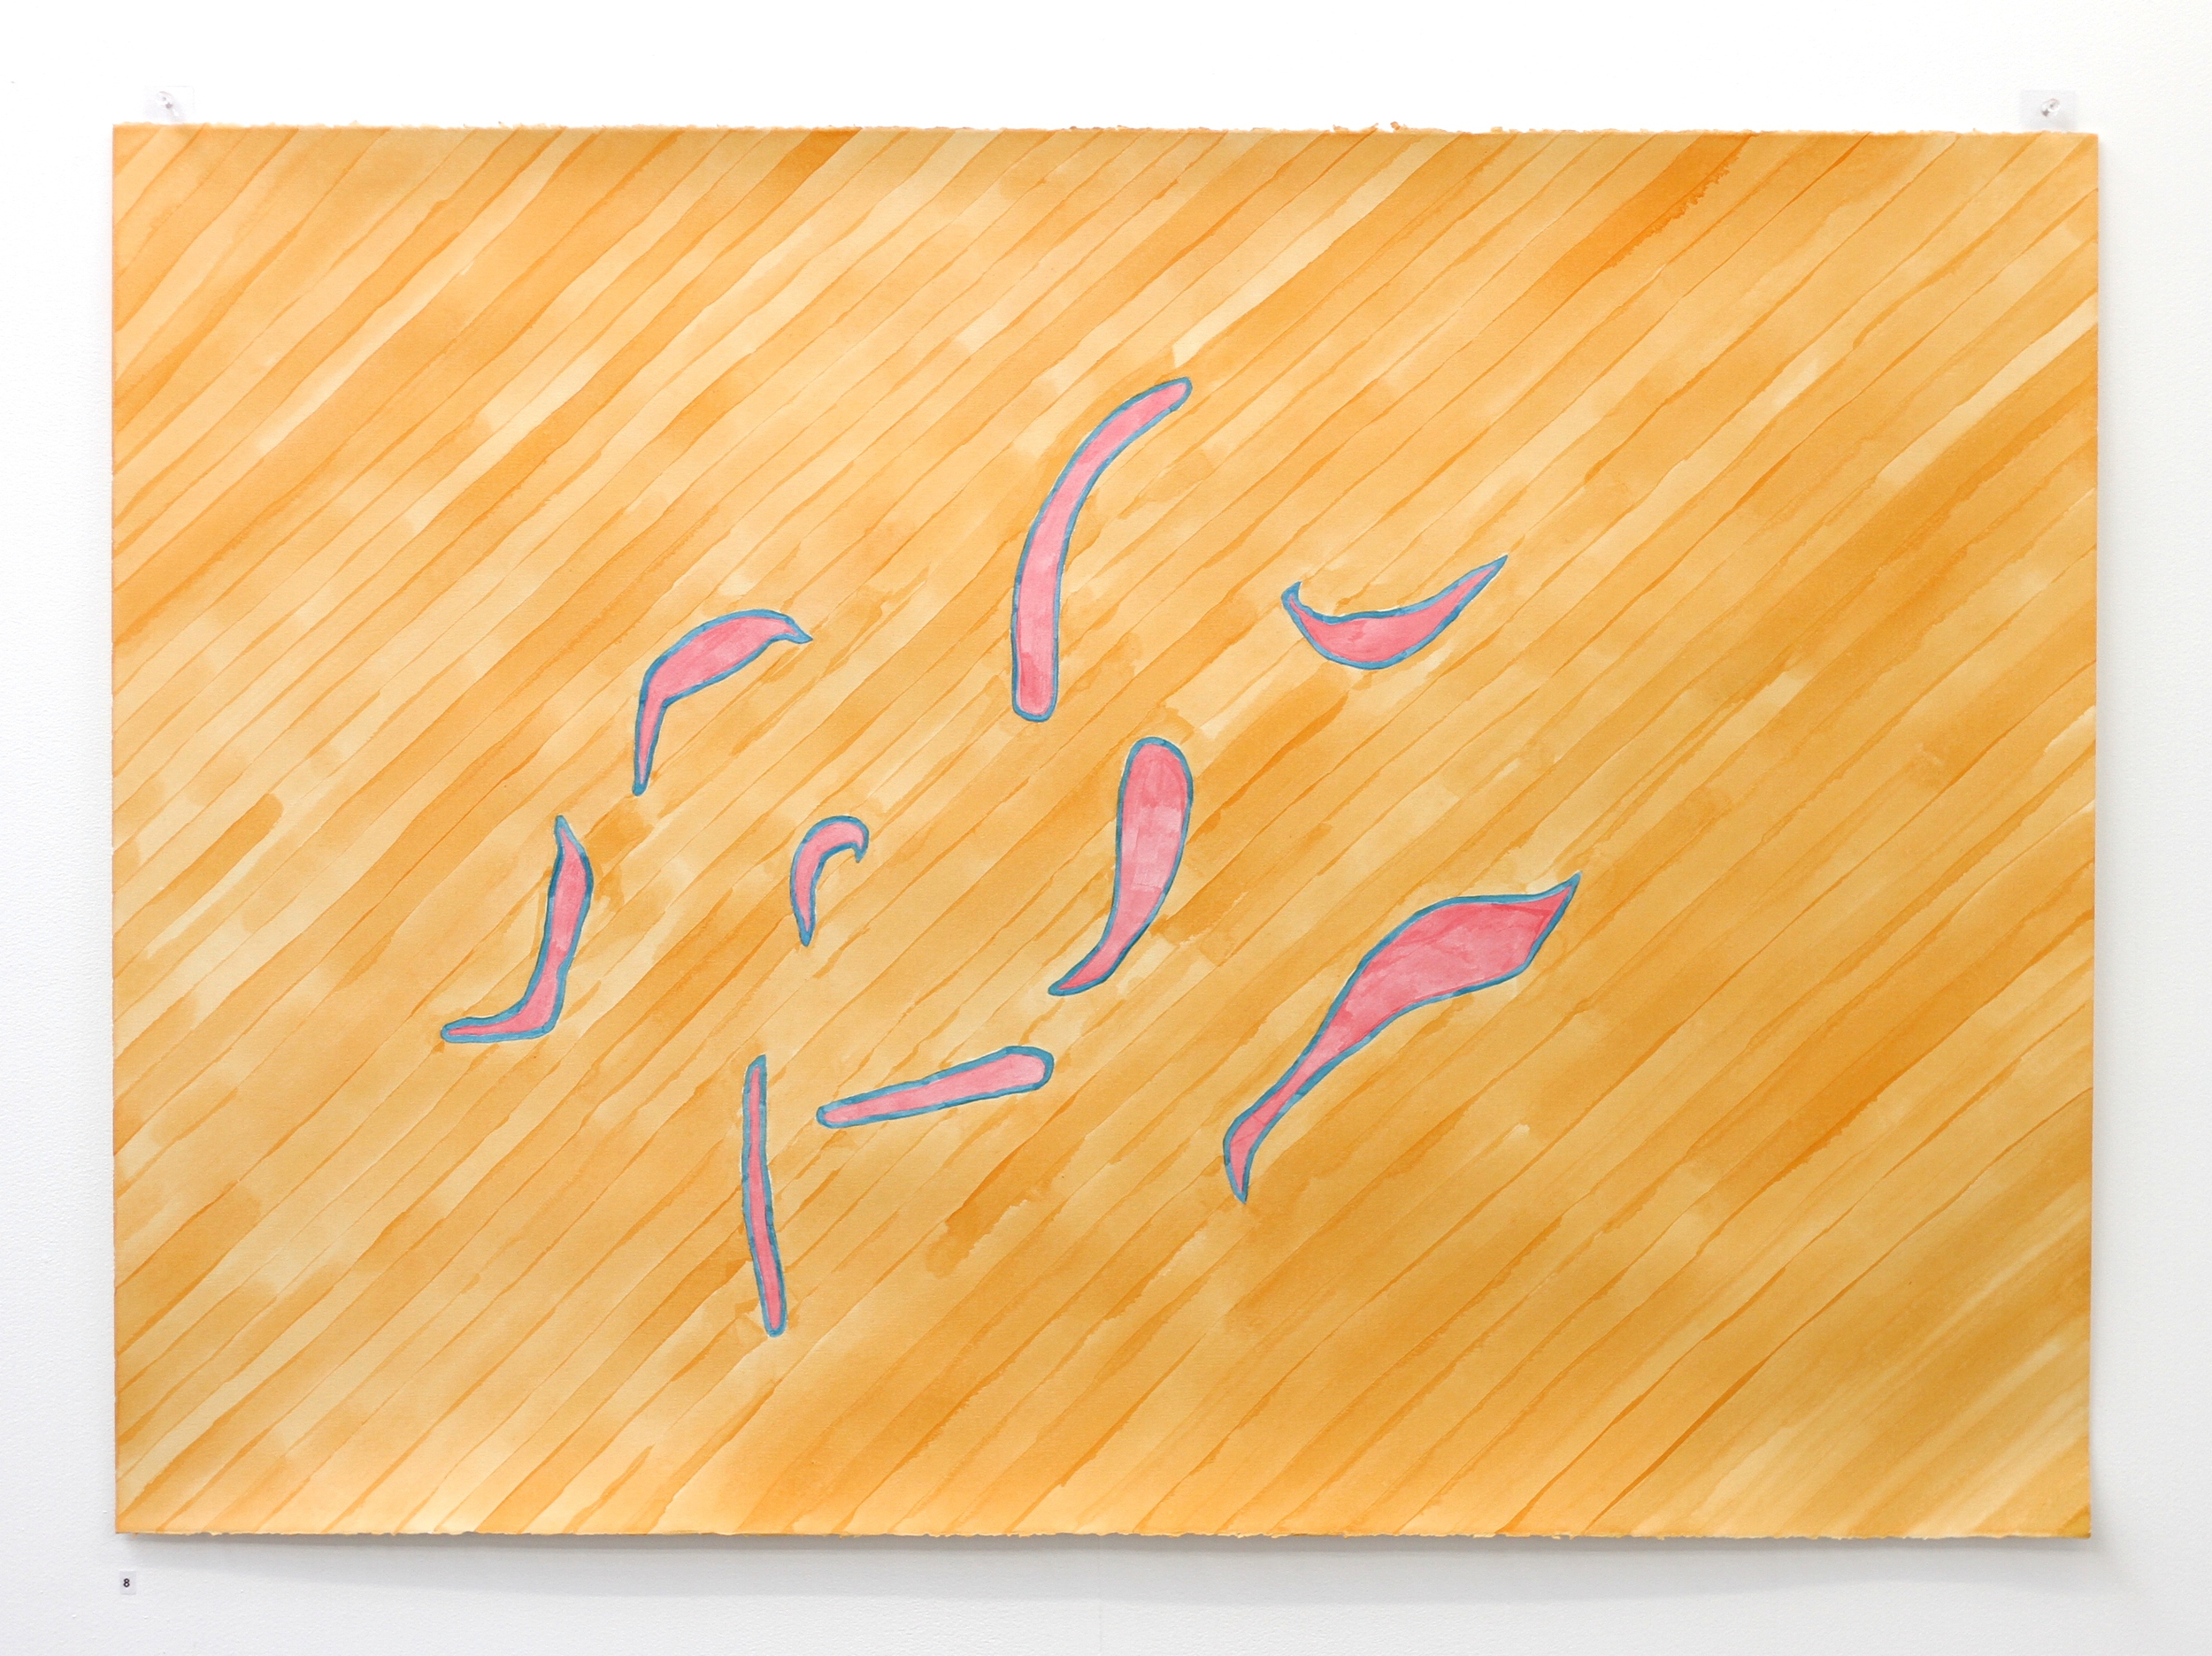 Ān fenjān hāye chāī ke bā ham nanooshidim / Those cups of tea we didn't share II - Léuli Eshraghi, acrylic on Fabriano paper, 100 x 71cm, 2014